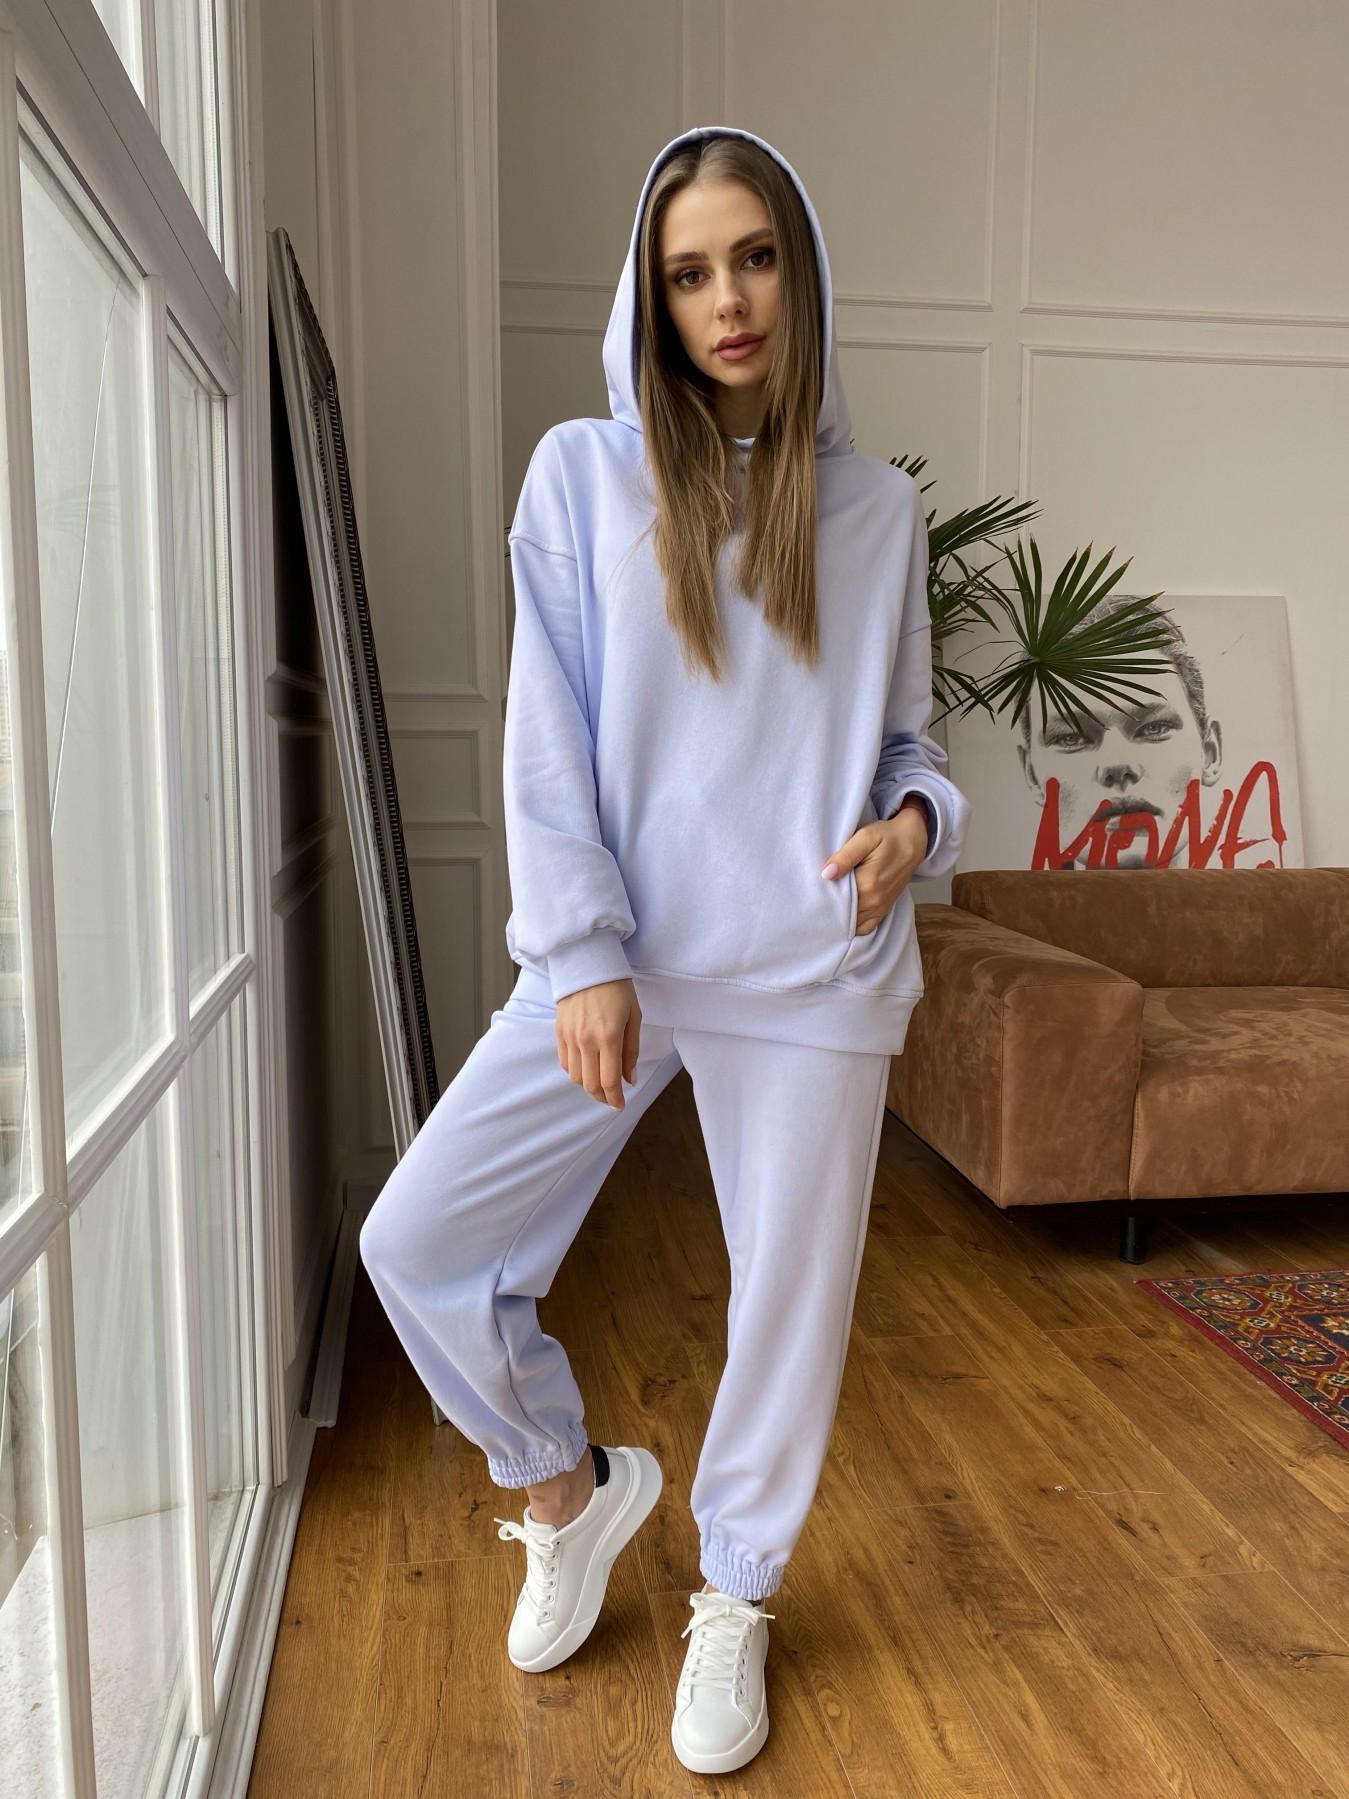 Марион костюм из 3х нитки 10581 АРТ. 47635 Цвет: Голубой Светлый - фото 4, интернет магазин tm-modus.ru